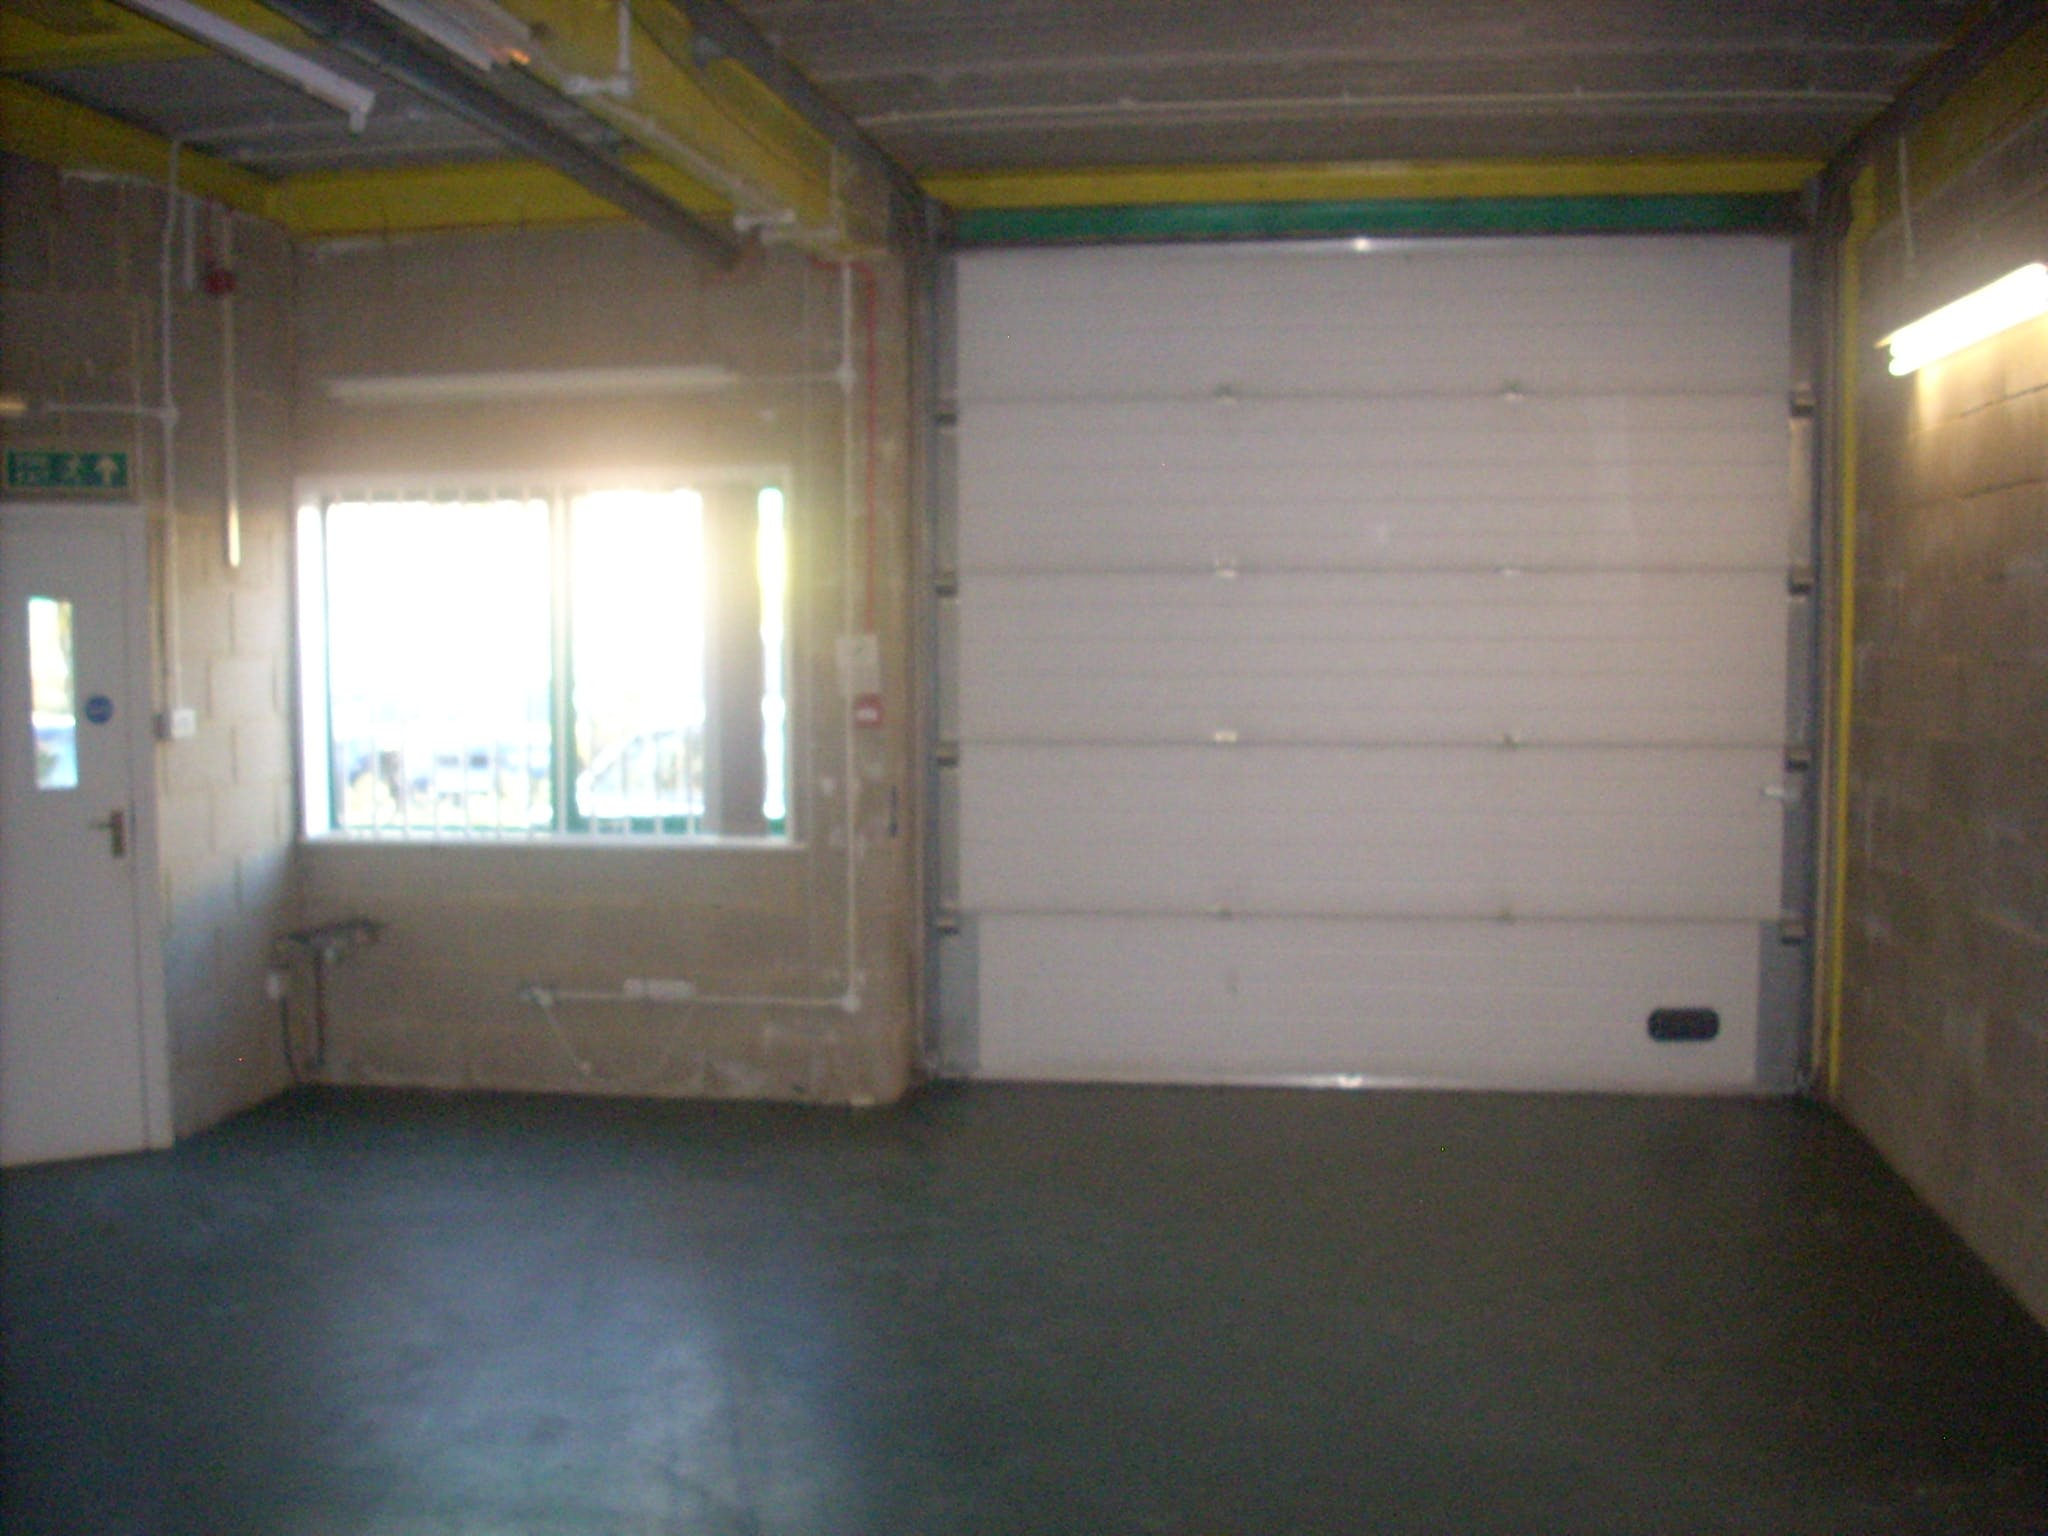 Unit 3, Brickfields Industrial Park, Kiln Lane, Bracknell, Industrial To Let - DSCN5637.JPG